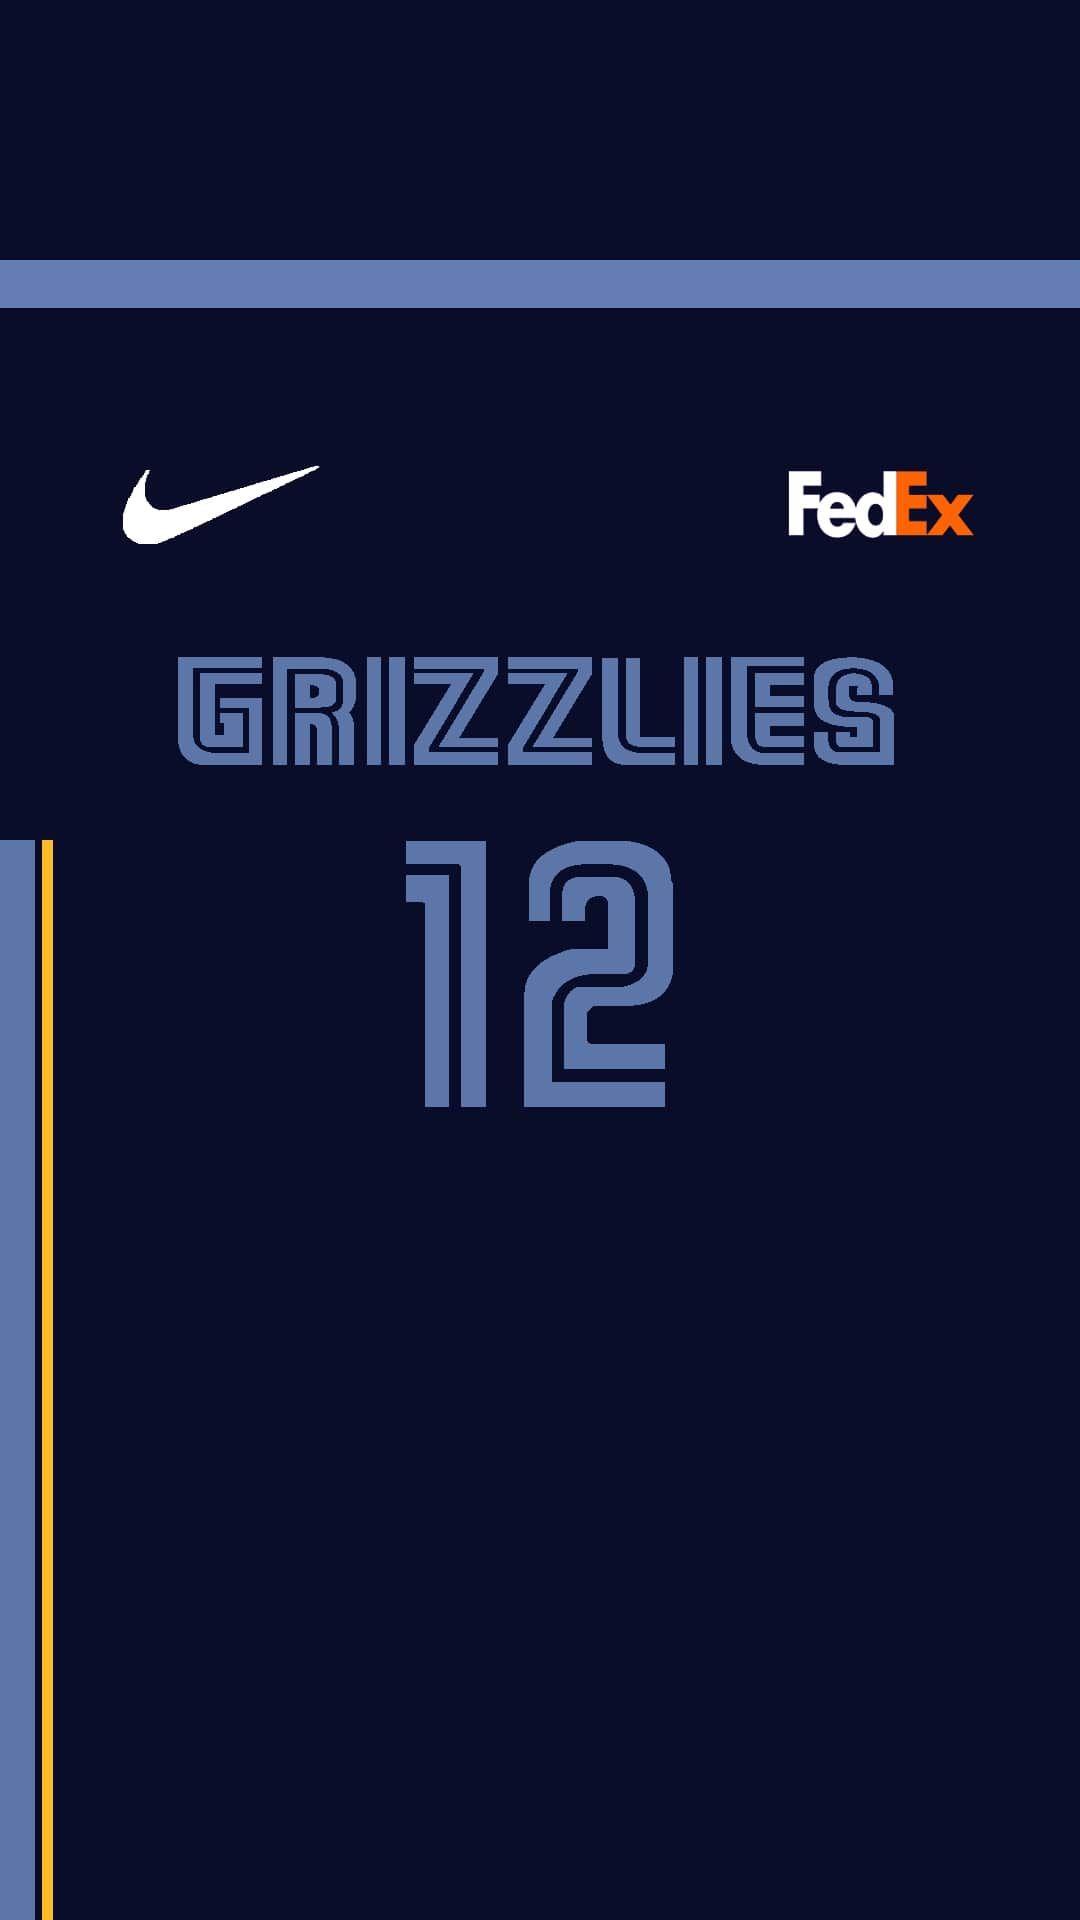 Grizzlies Morant Nba Wallpapers Nba Jersey Memphis Grizzlies Basketball